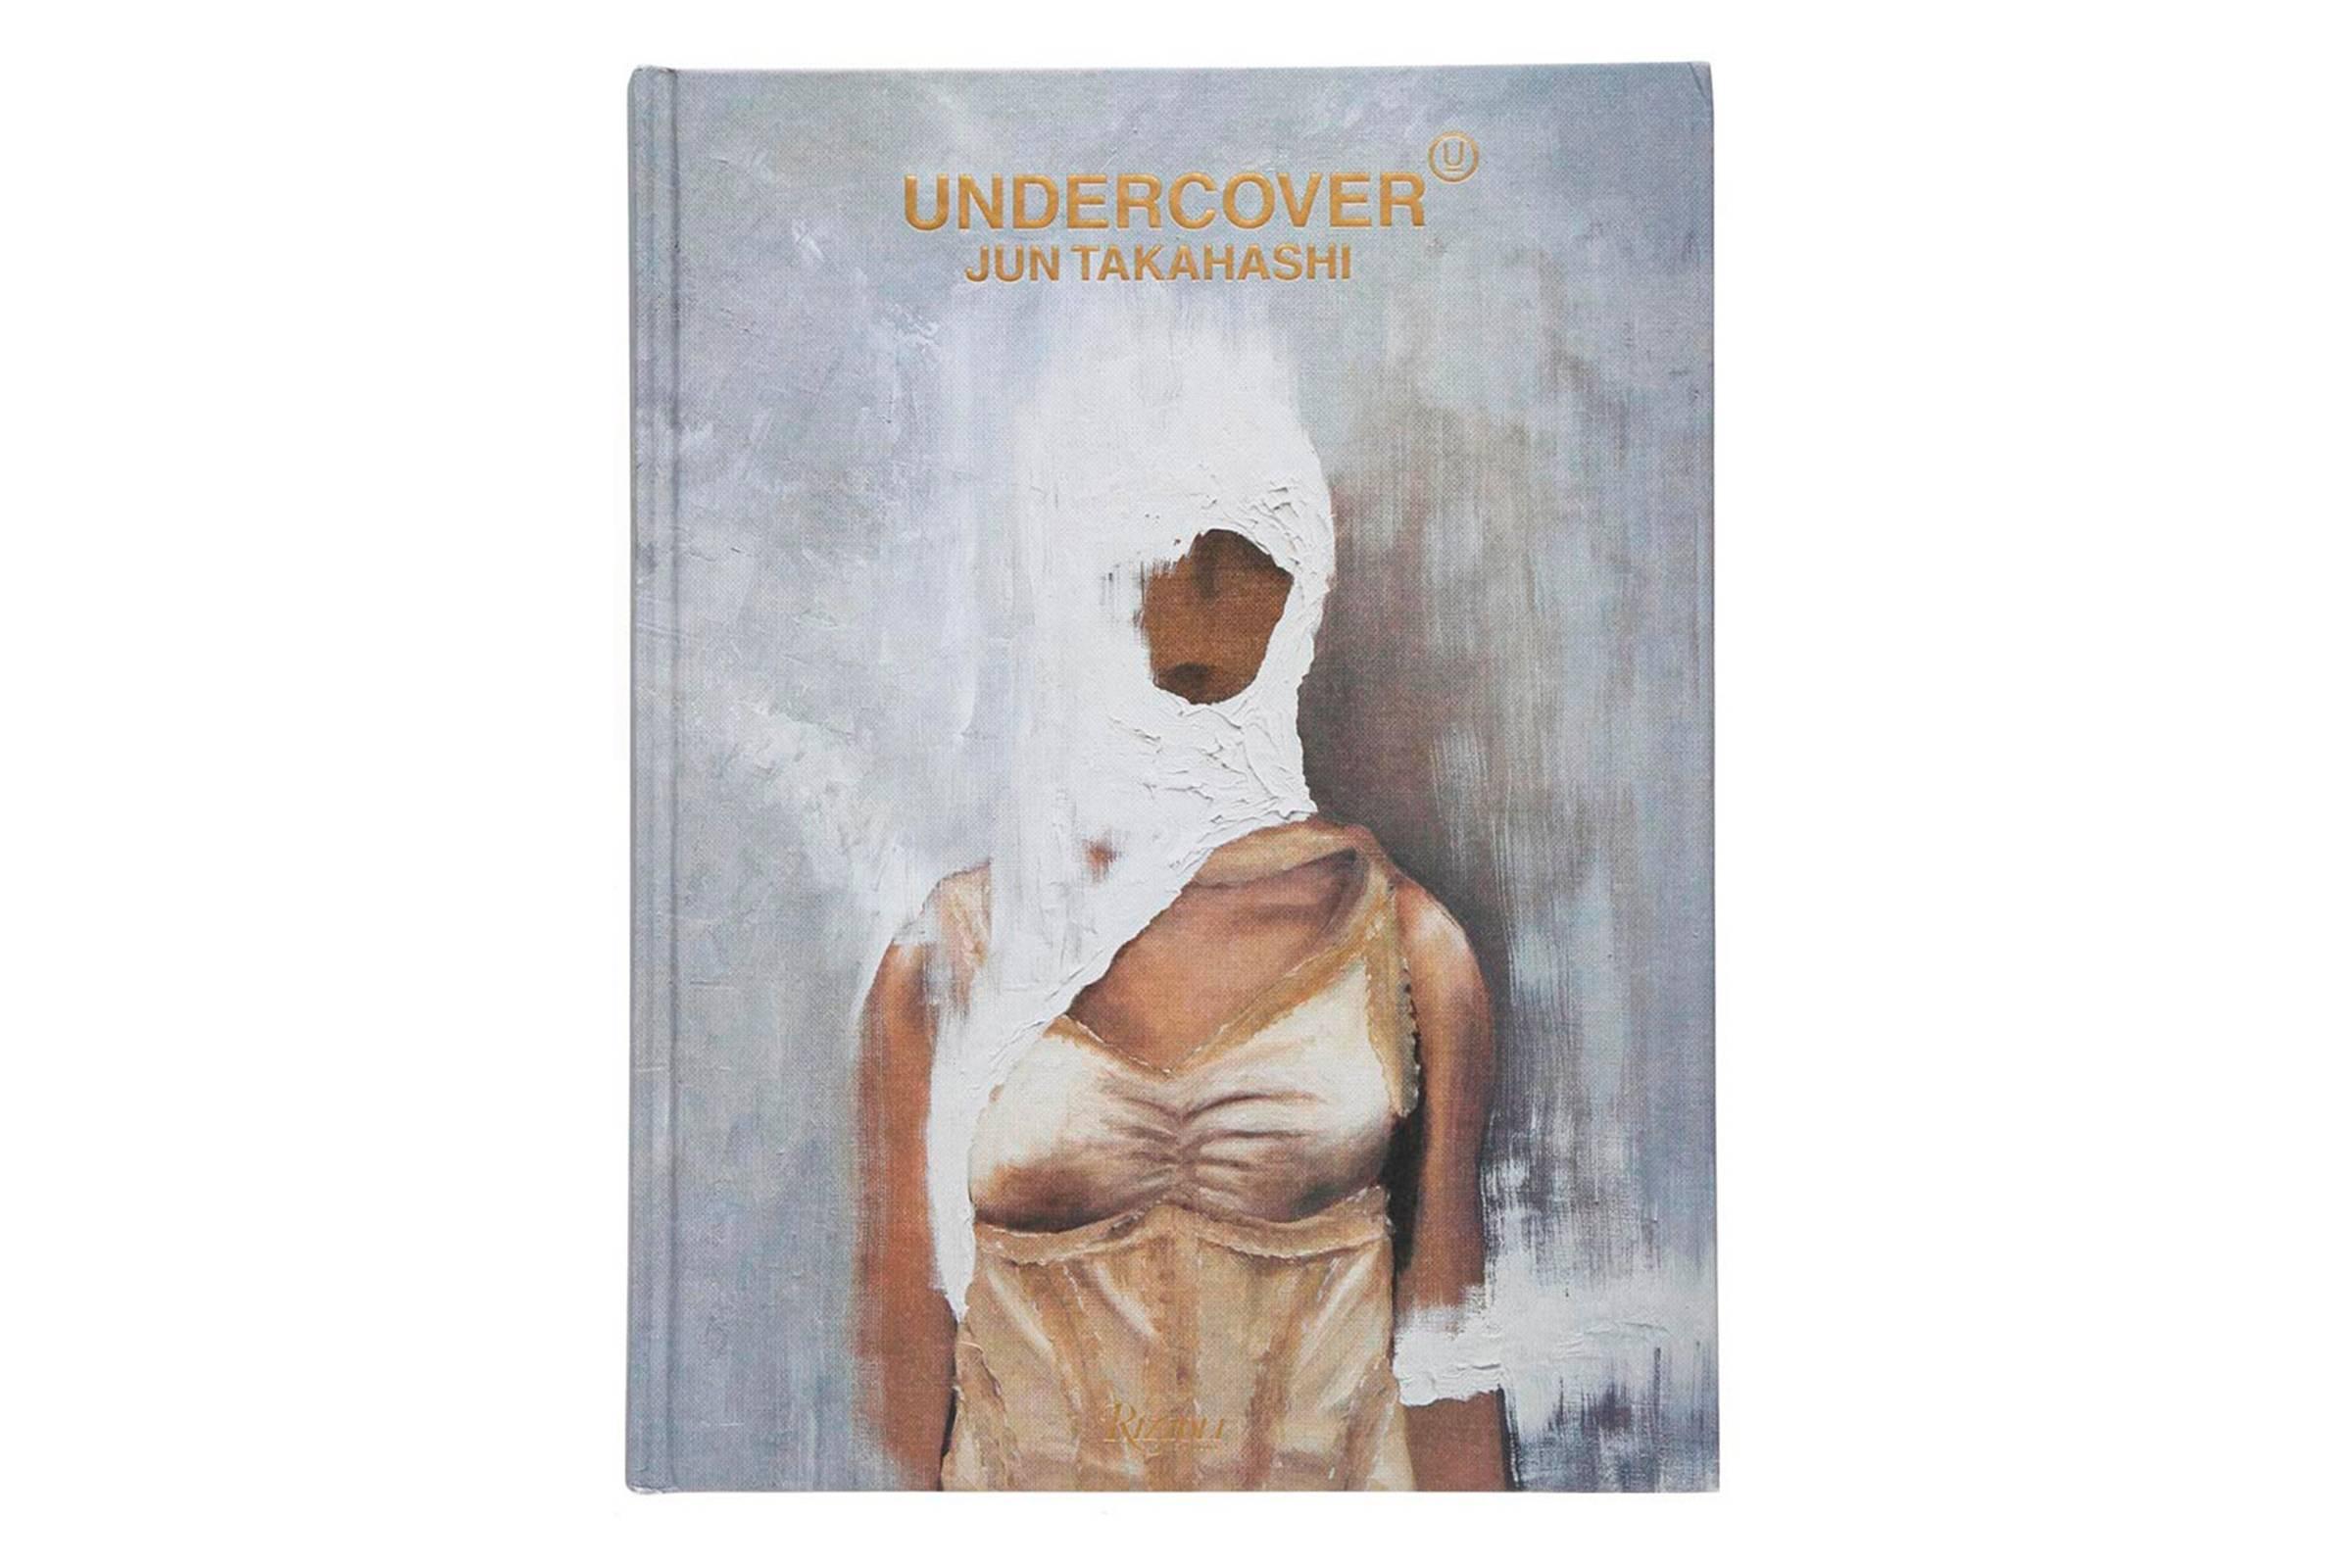 *Undercover: Jun Takahashi* (2016)